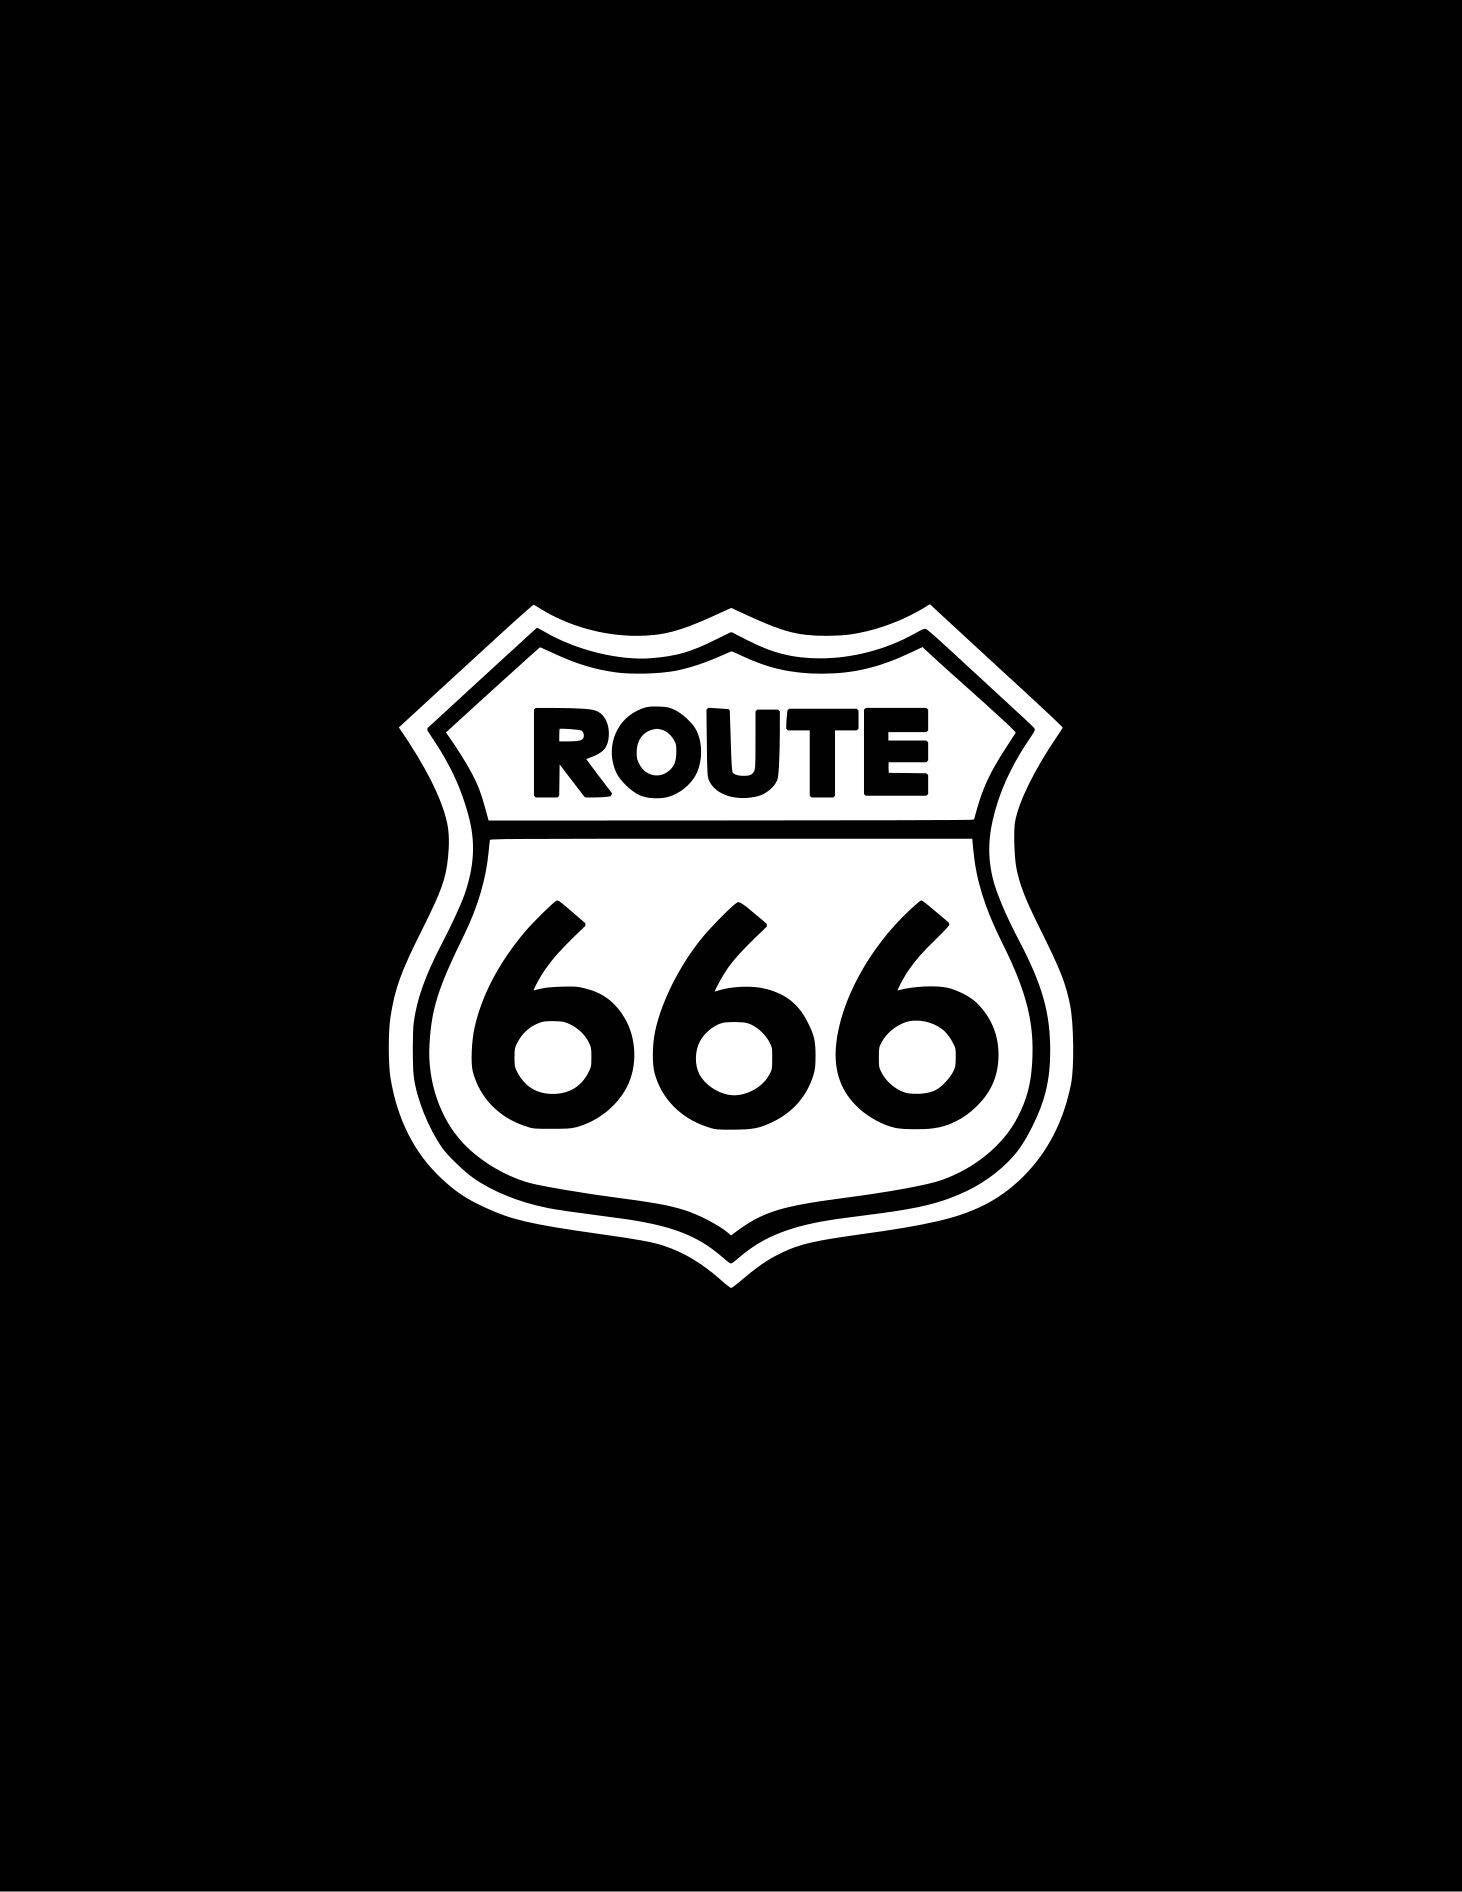 Route 666 Decal 666 Vinyl Decal Sticker Yeti Tumbler Cooler Window Bumper Route 666 Sticker Vinyl Decal Stickers Satanic Art Stickers [ 1892 x 1462 Pixel ]